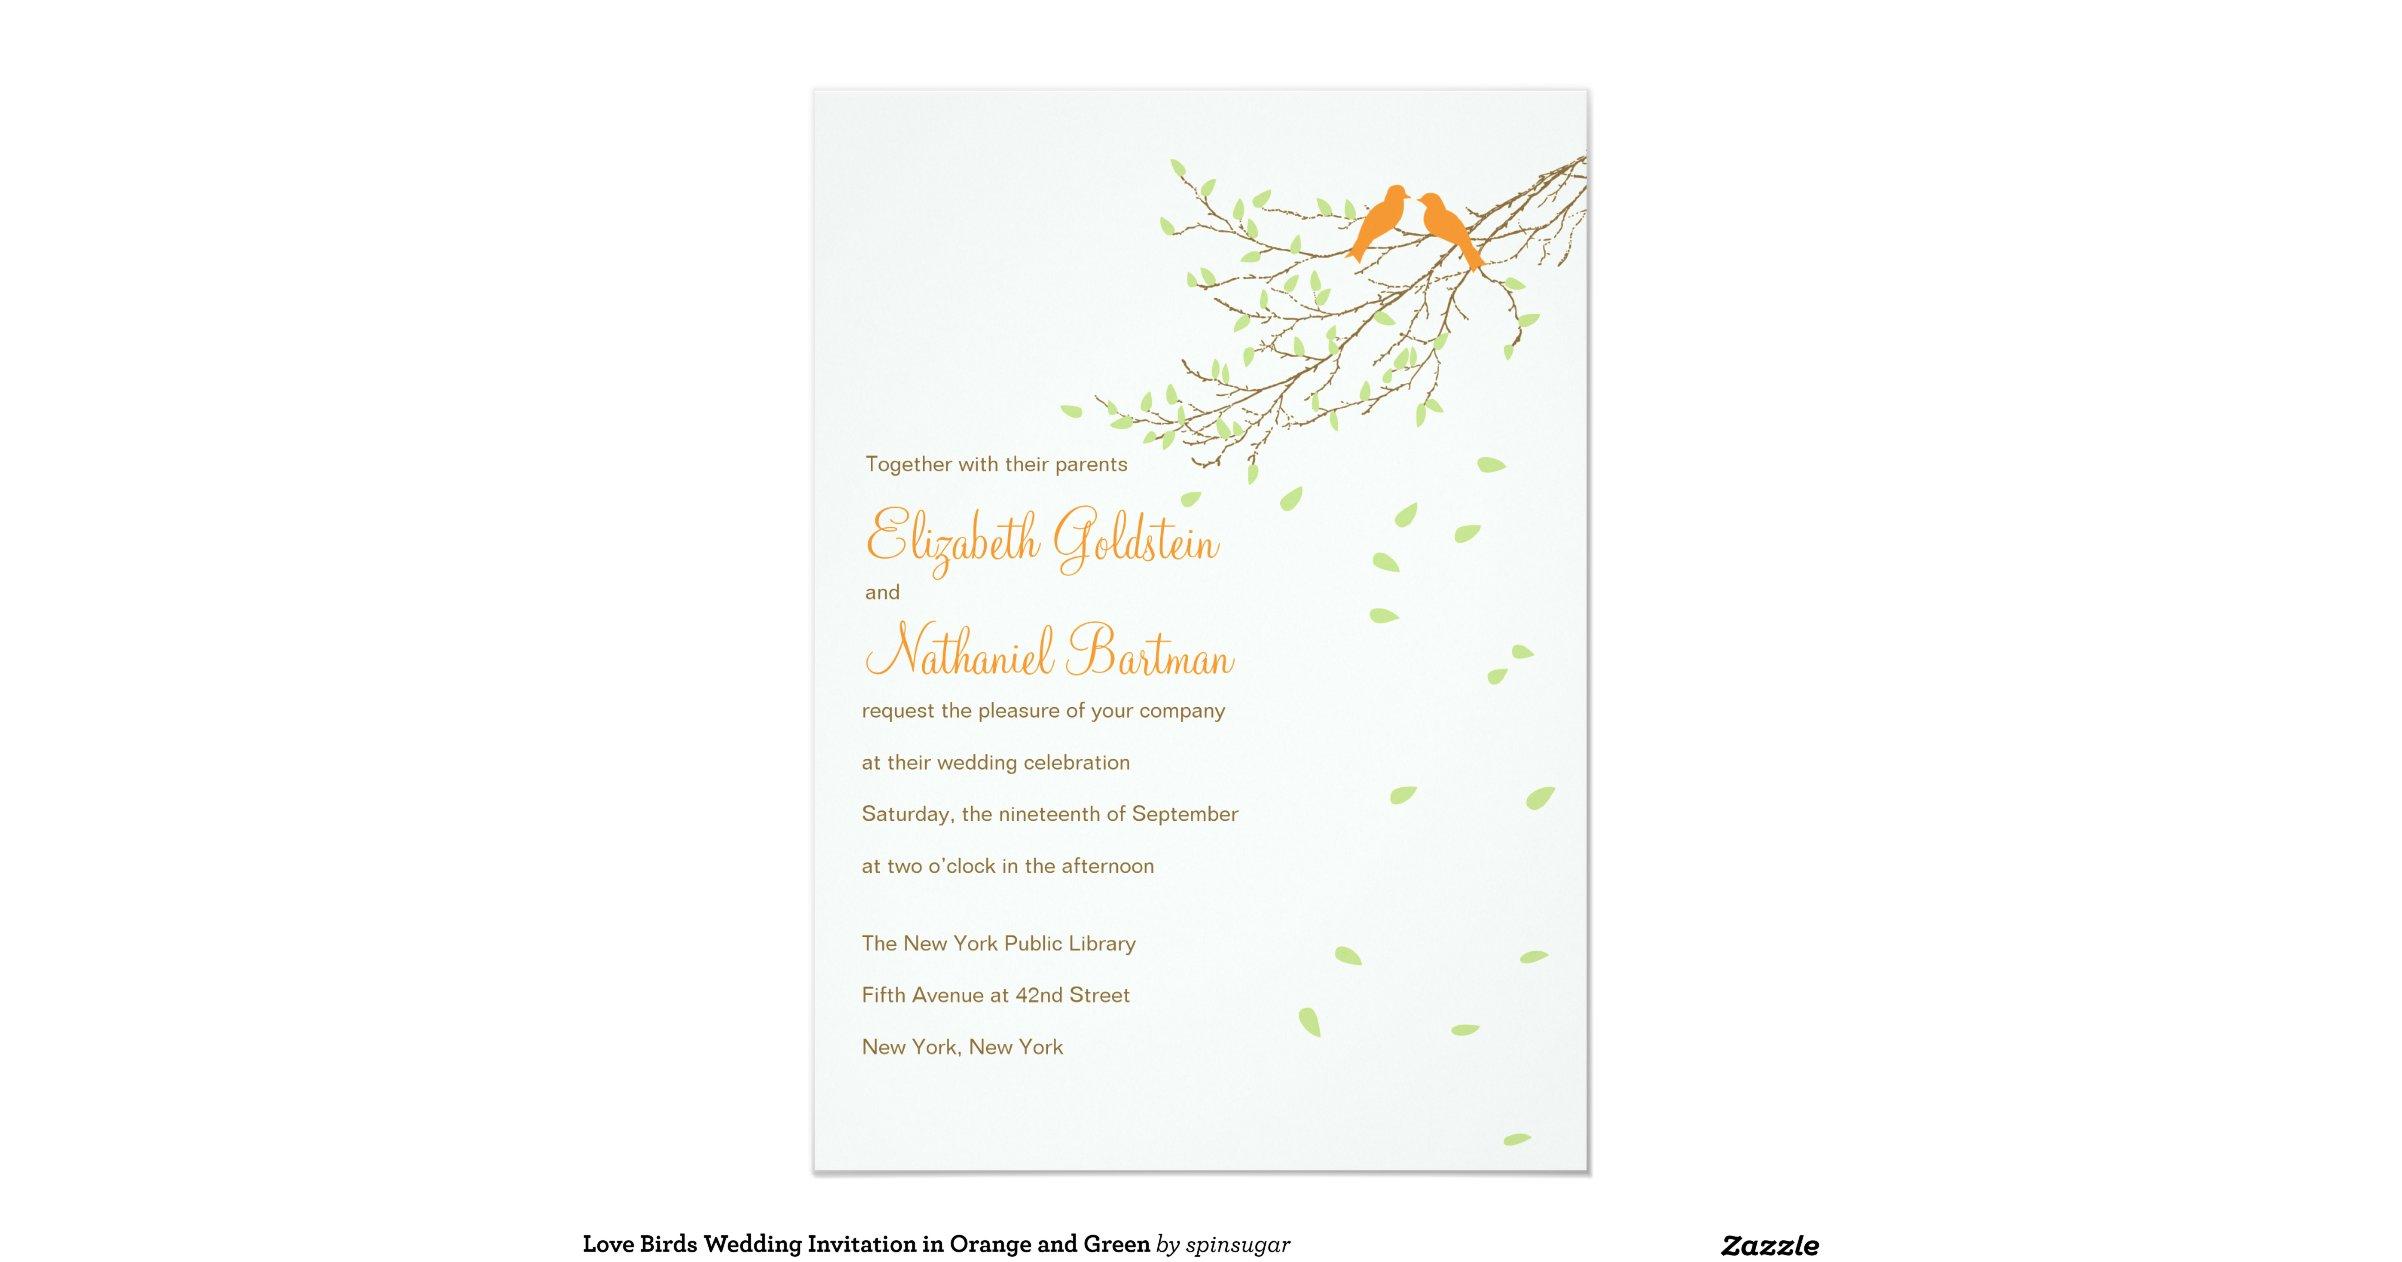 Love Birds Wedding Invitations: Love_birds_wedding_invitation_in_orange_and_green